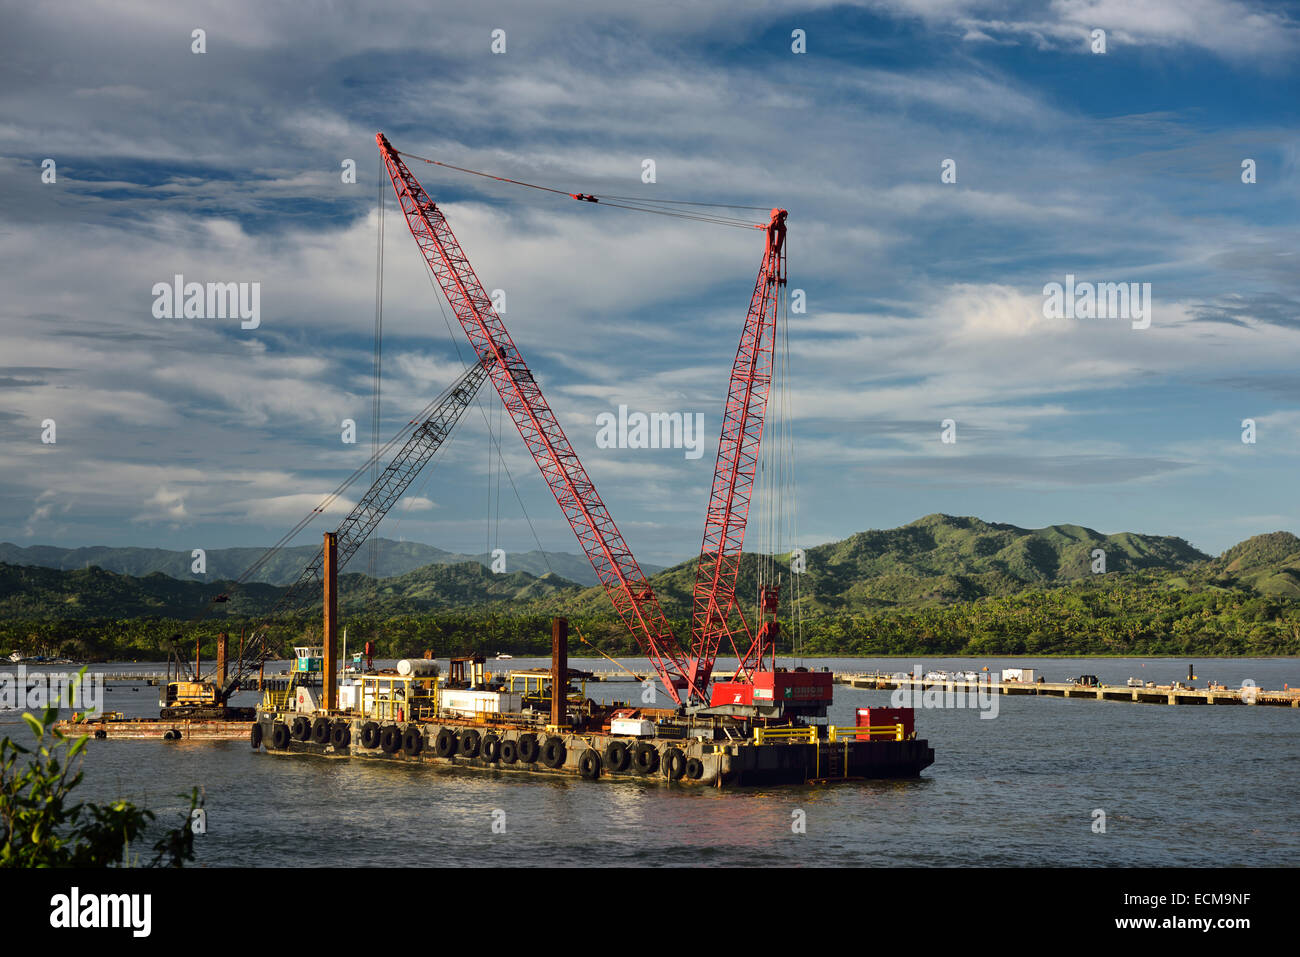 Crane barge constructing new cruise ship terminal in Maimon Bay near Puerto Plata Dominican Republic - Stock Image